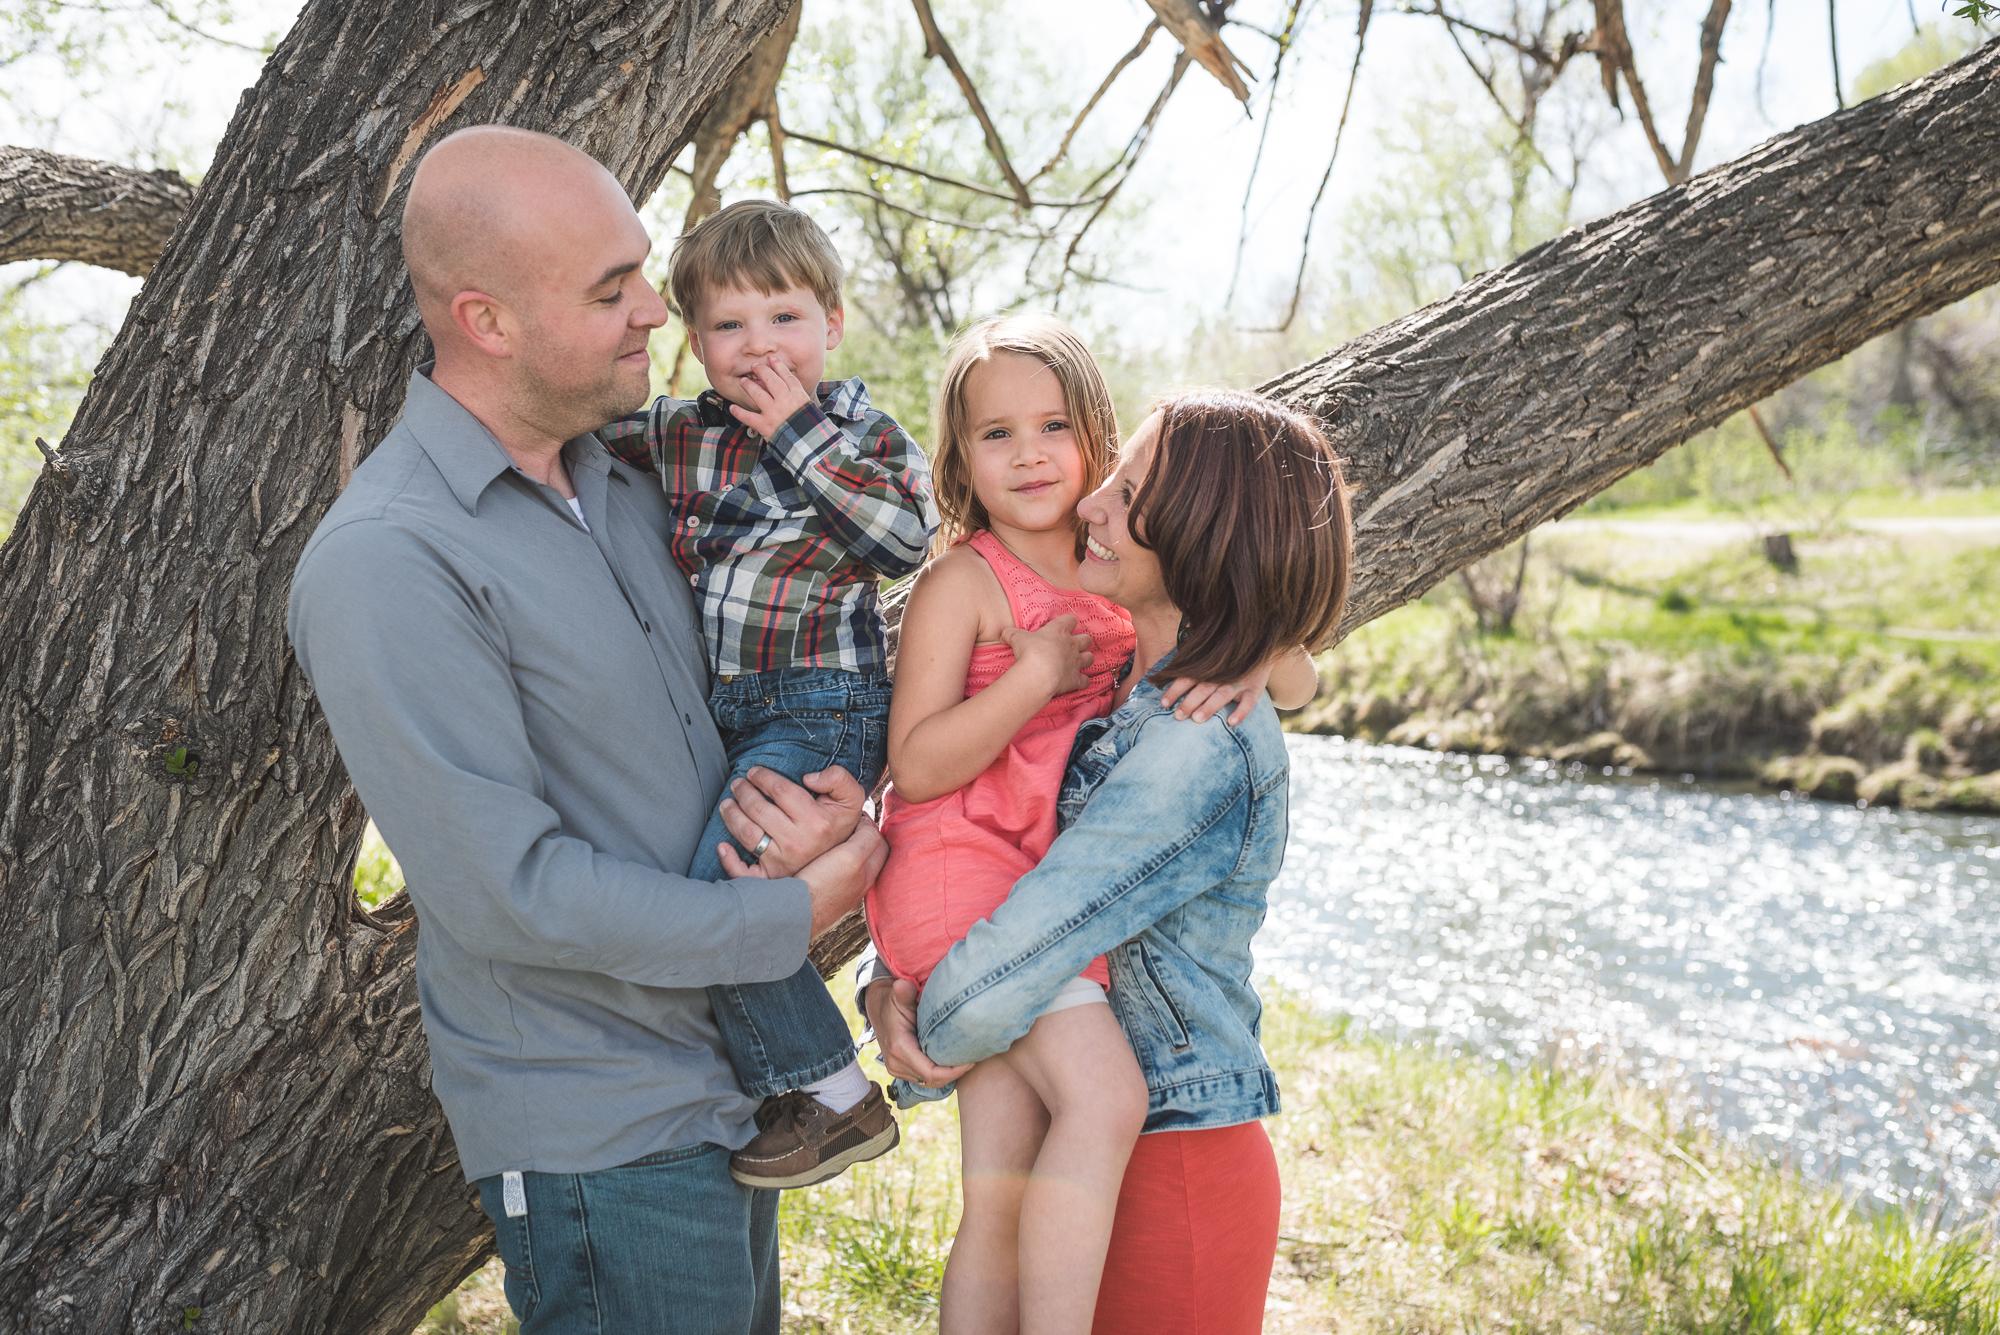 Denver+Boulder+Lifestyle+Family+Photographer+MiniSessions+JennyFolmanPhotography-7.jpg